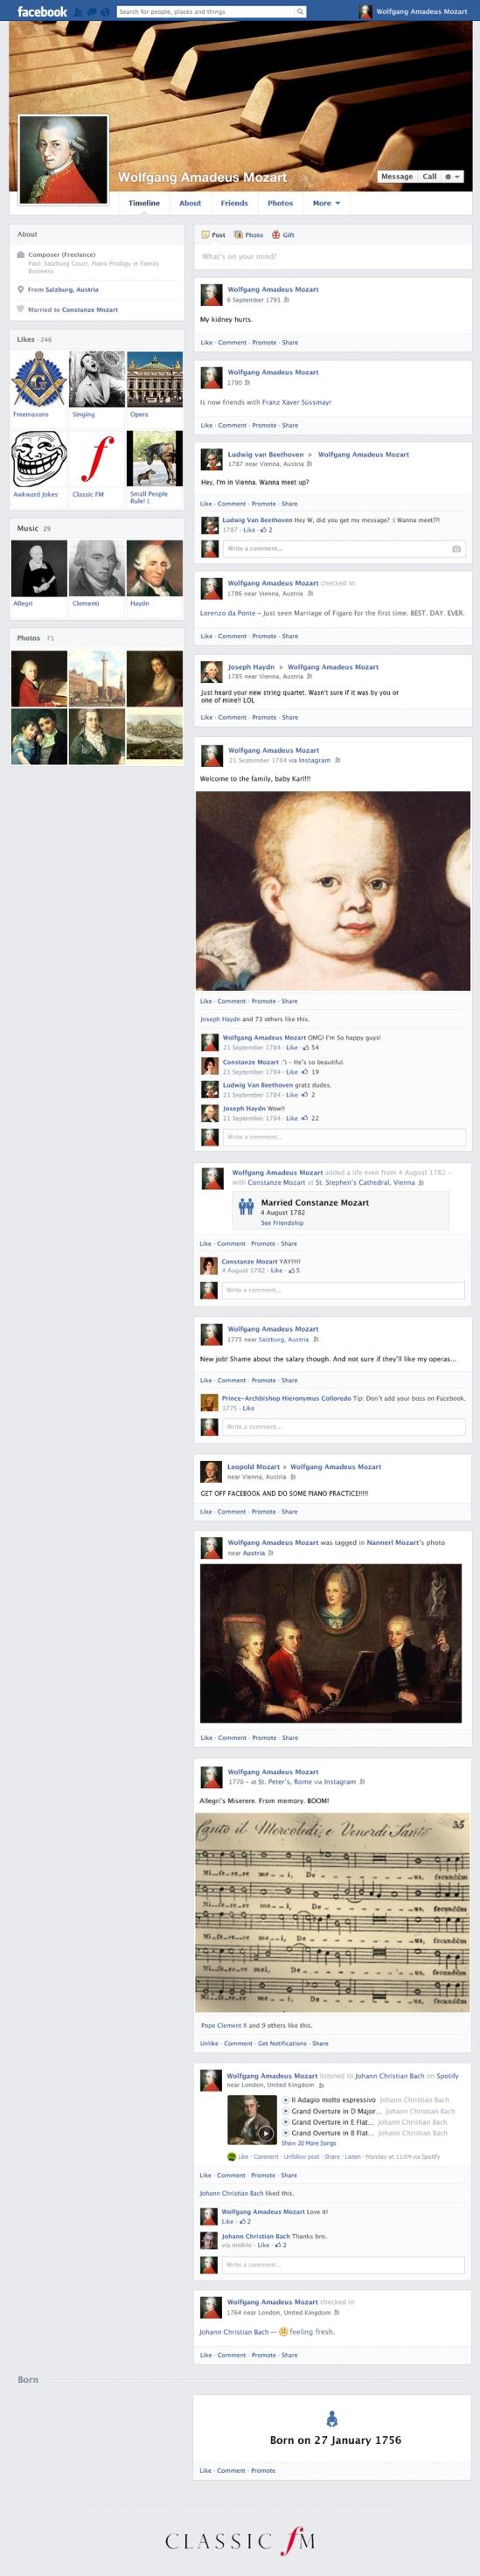 mozart-facebook